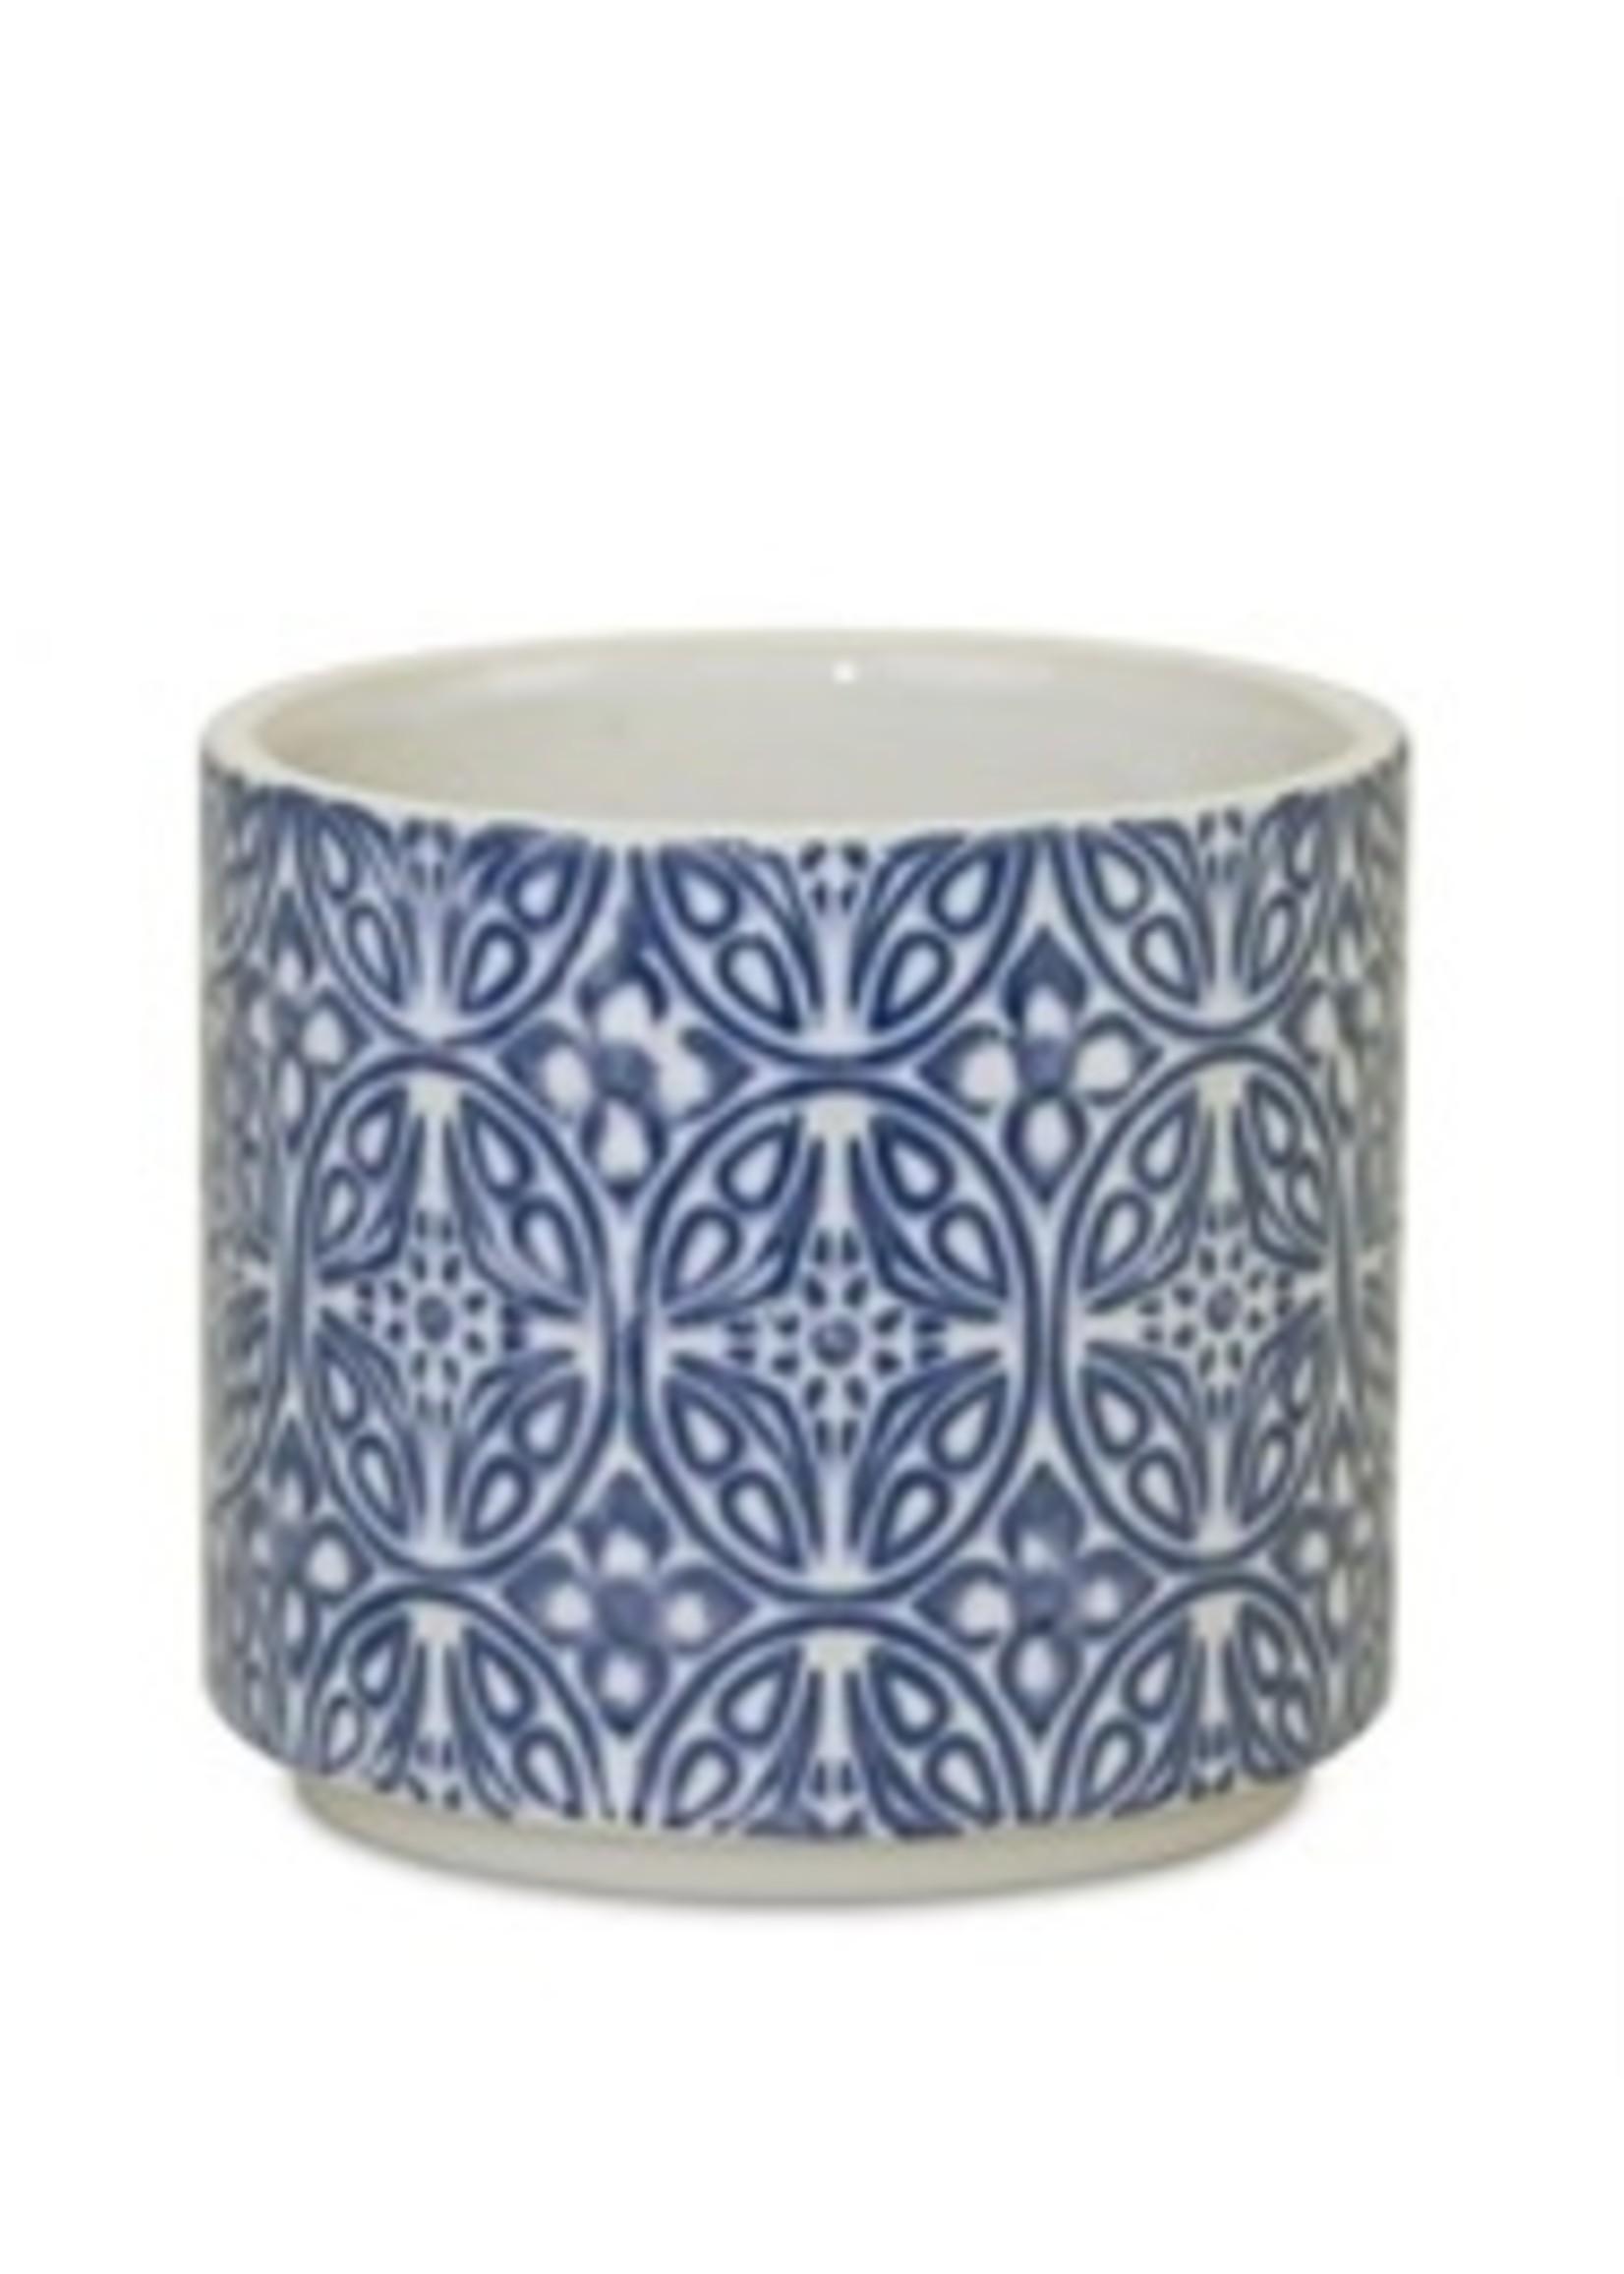 melrose Blue & White Ceramic Planter Small